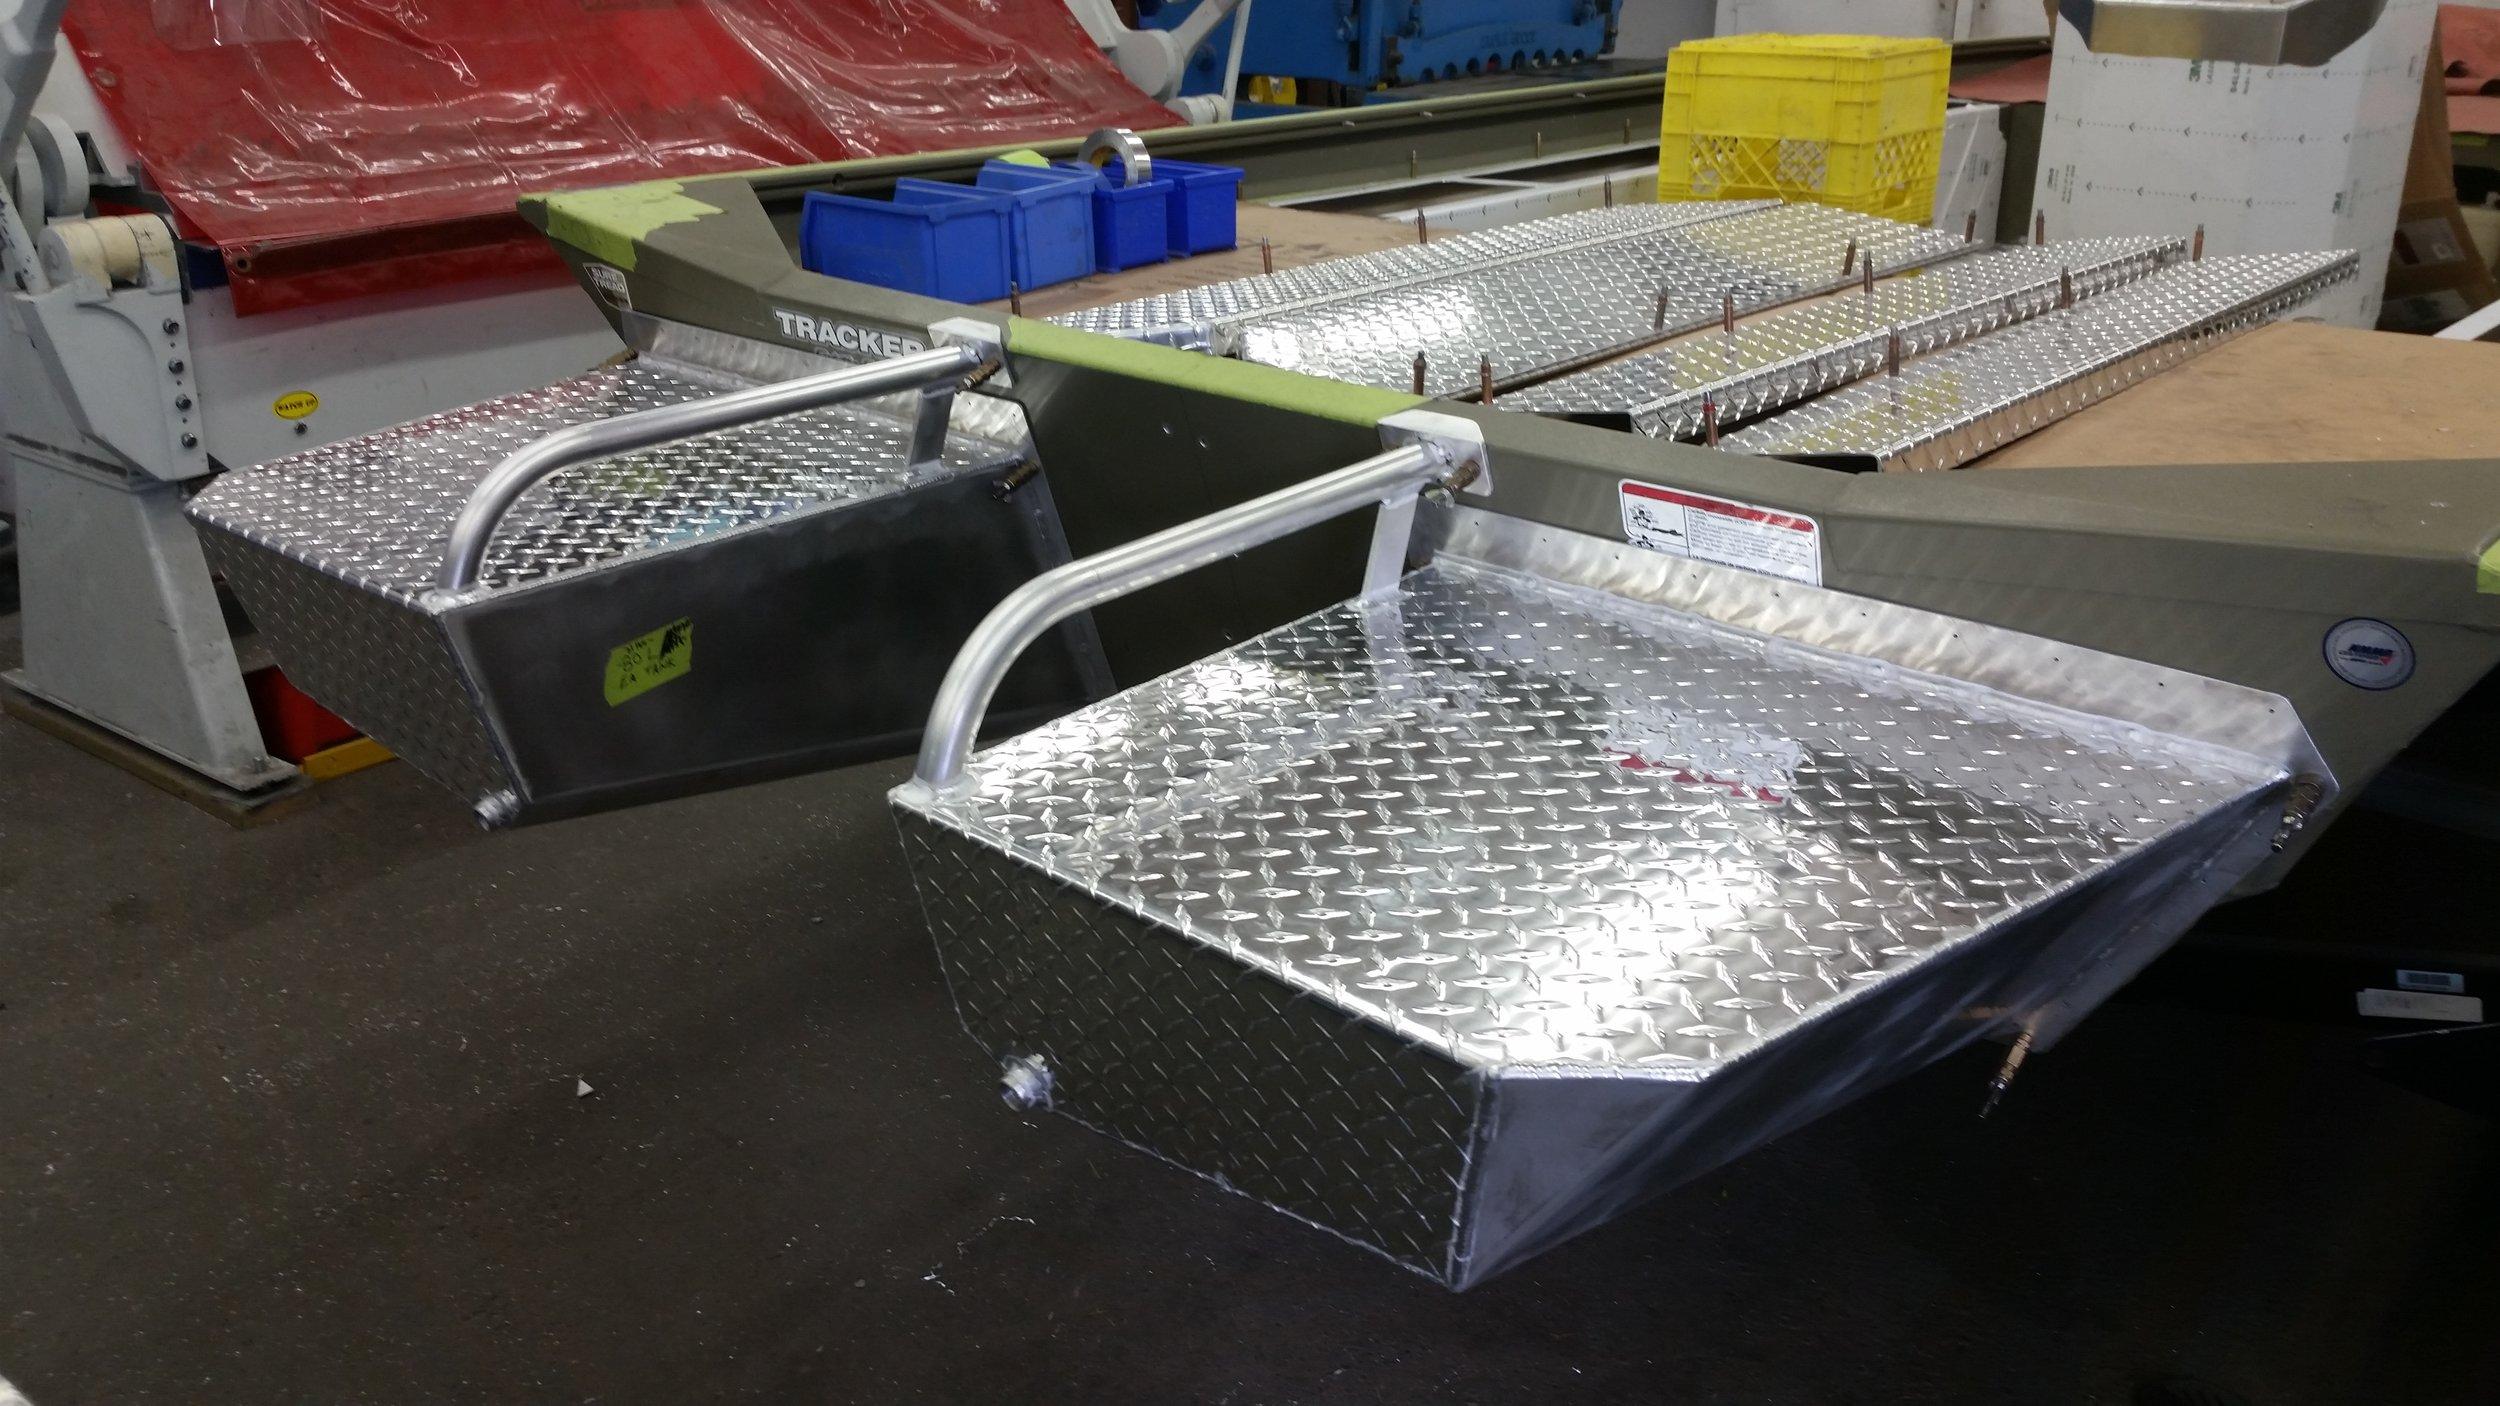 Iron Aero Boat and marine products